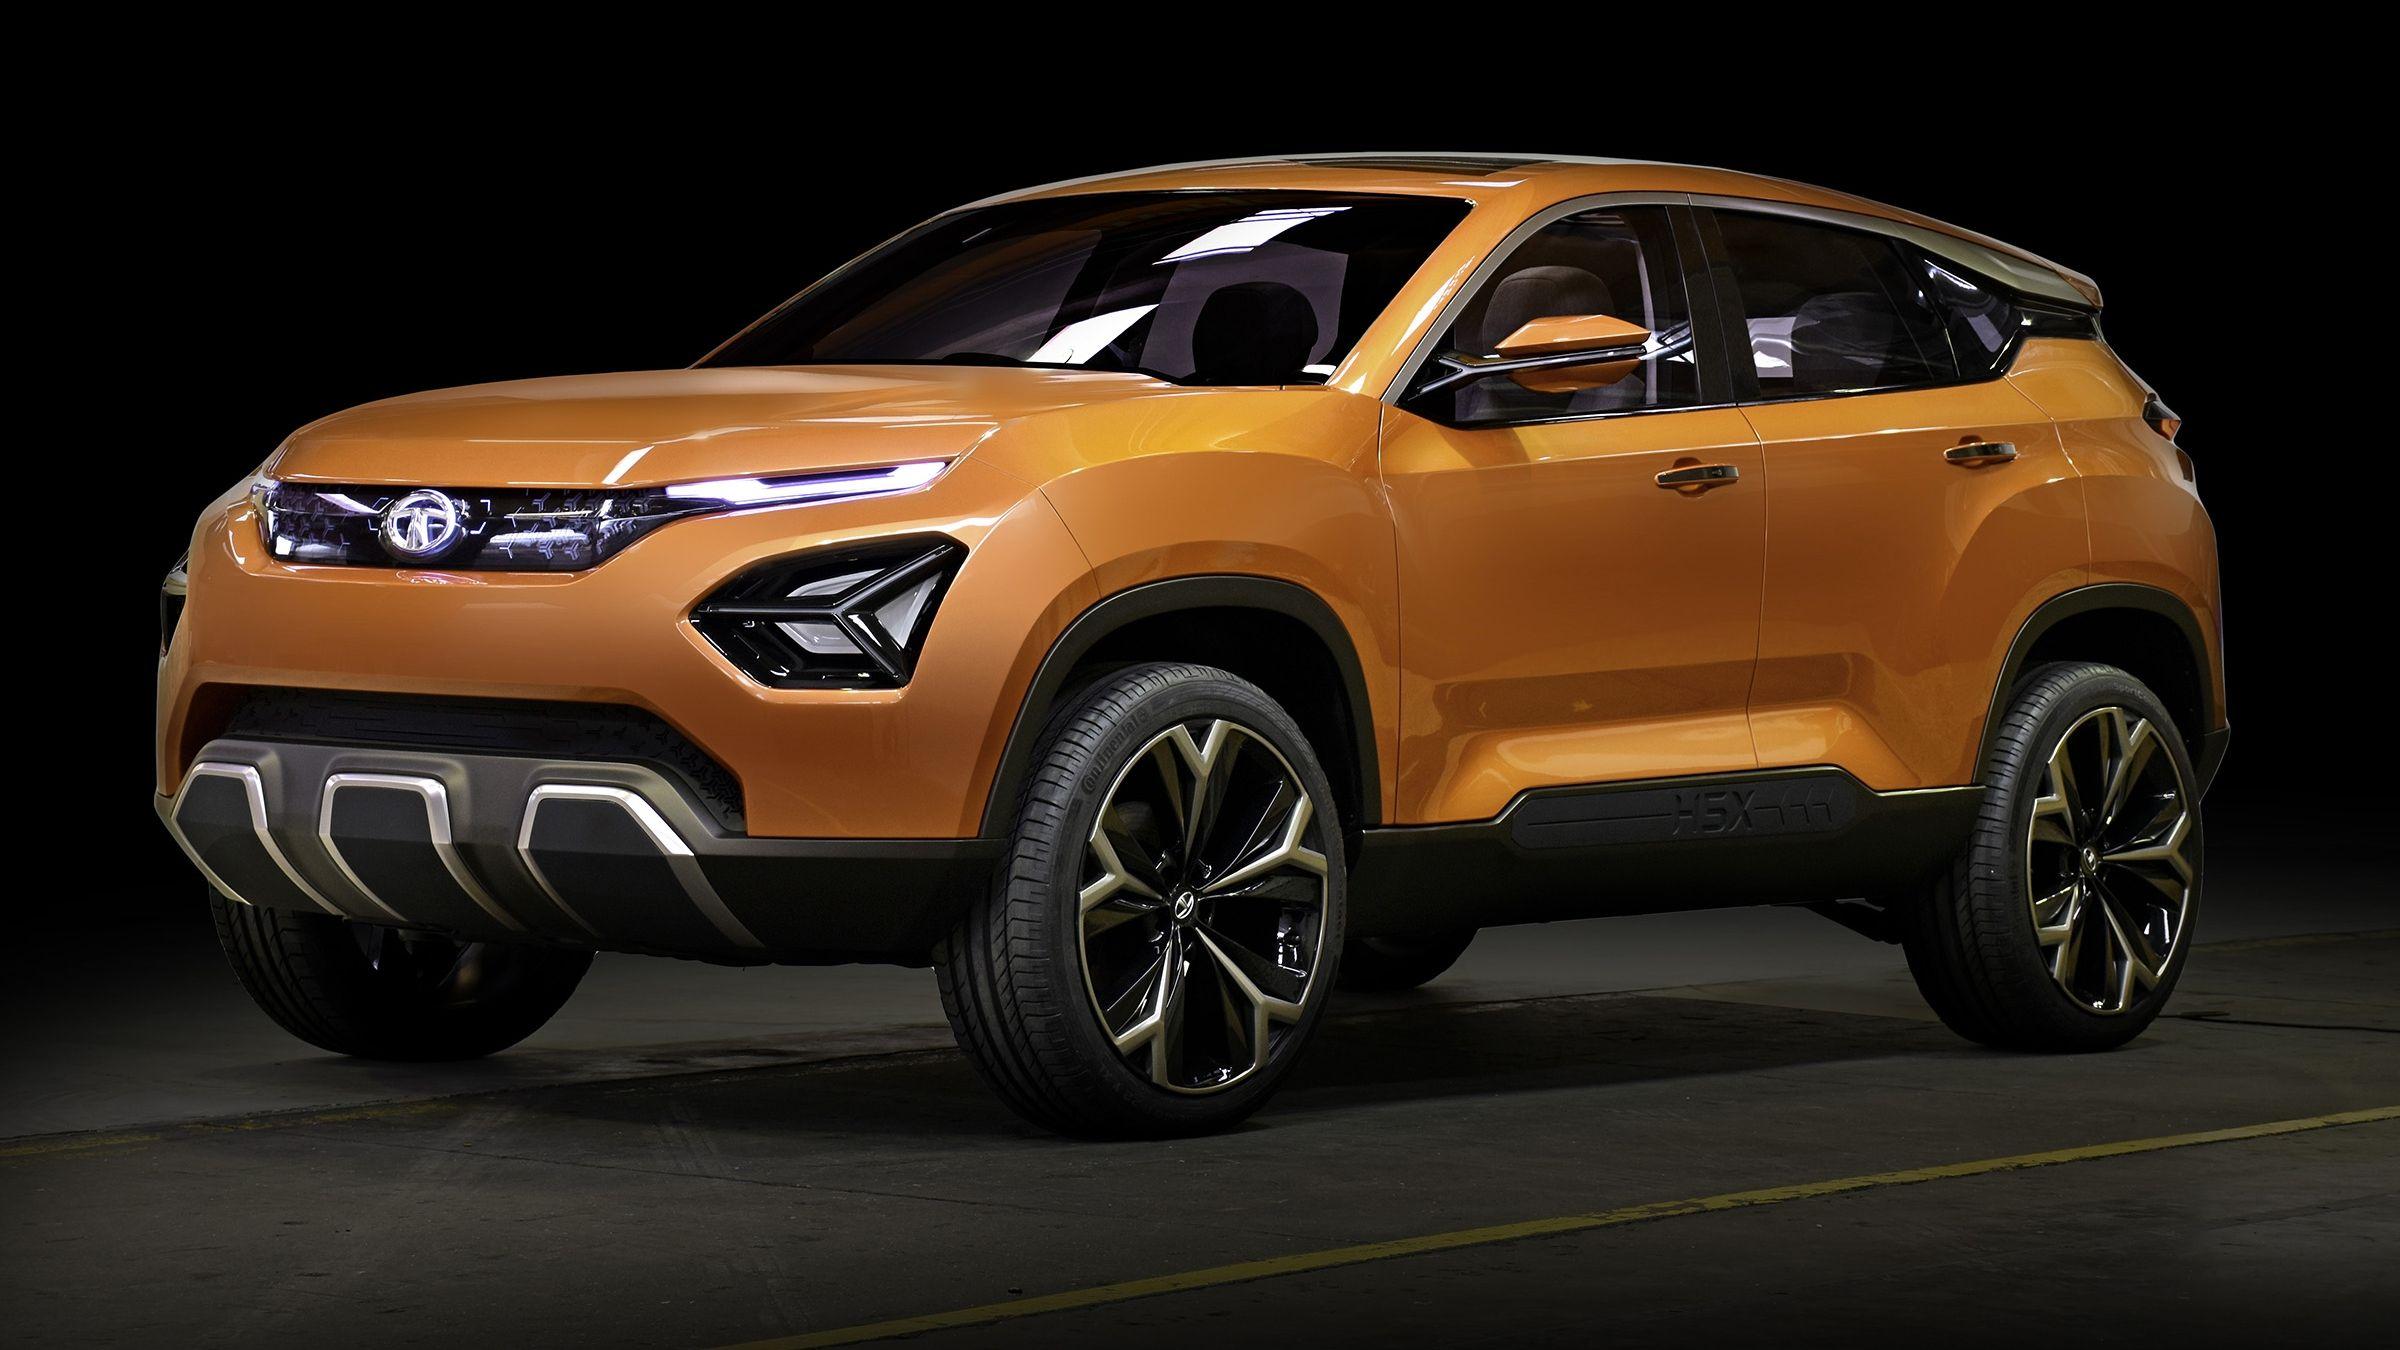 Tata H5x Concept Previews Land Rover Based Suv In Geneva Tata